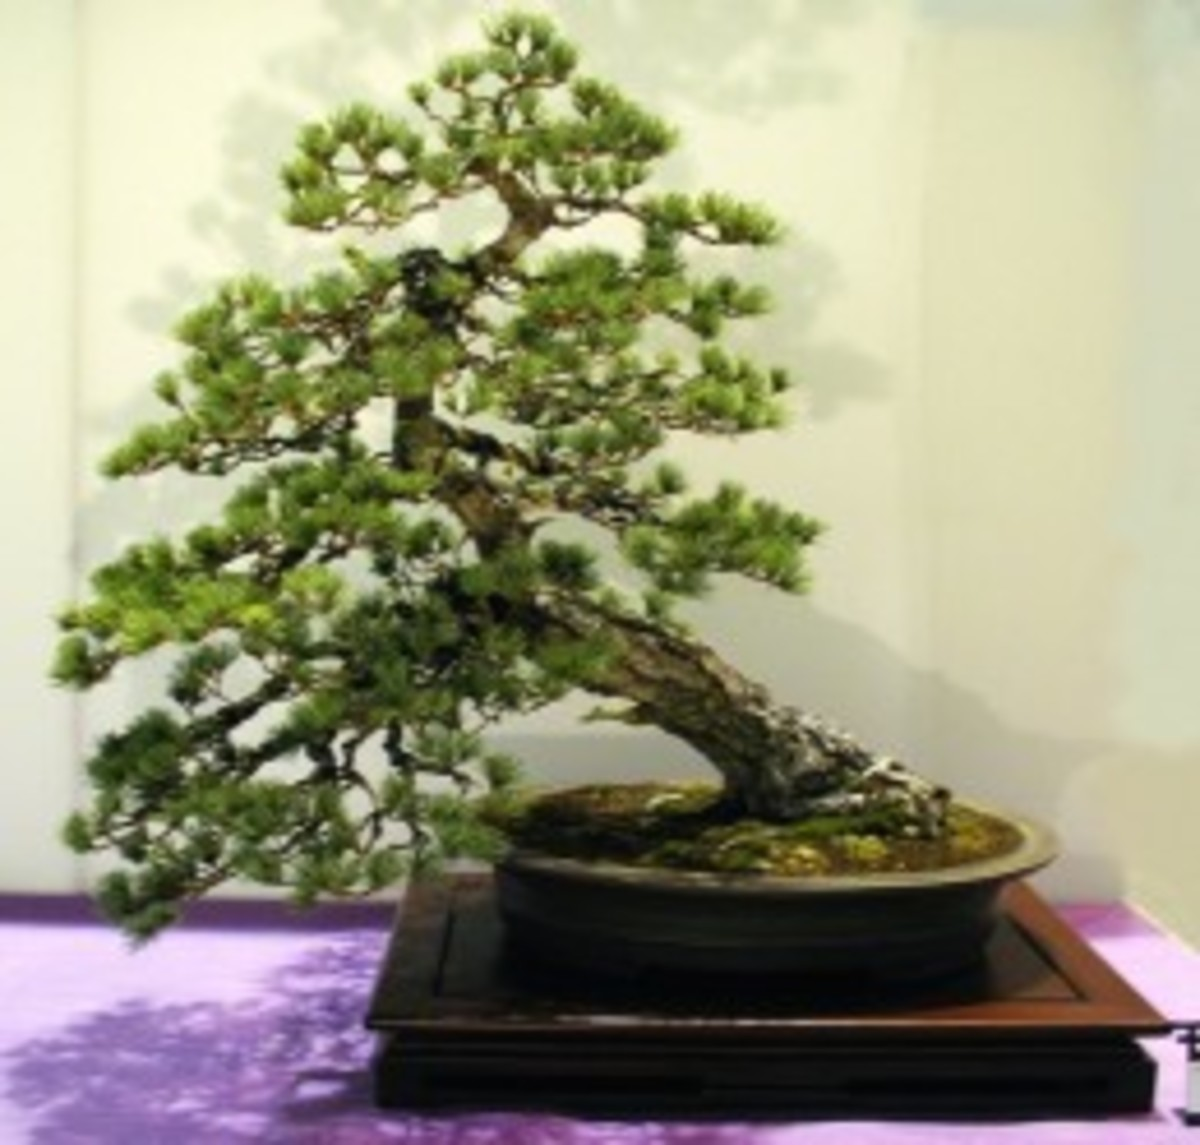 Gnarled or Hankan Style Bonsai